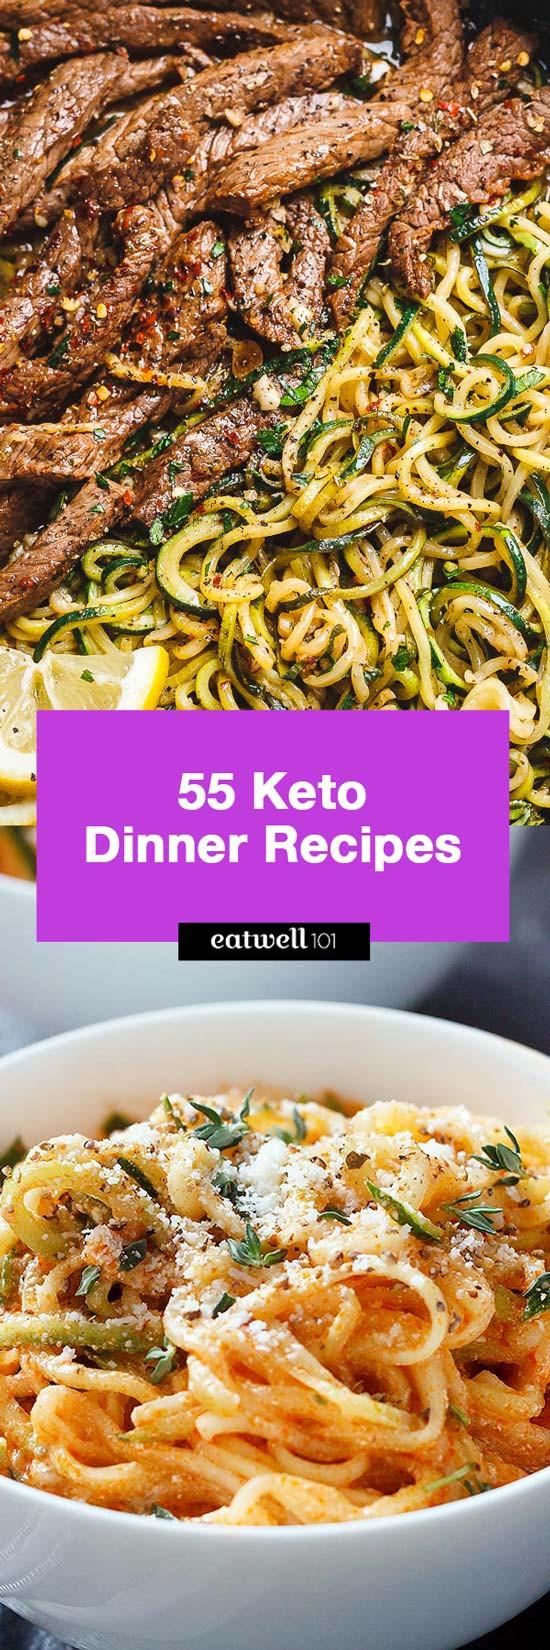 Keto Diet Dinner Recipes  Easy Keto Dinner Recipes – 65 Quick Recipe ideas for Keto